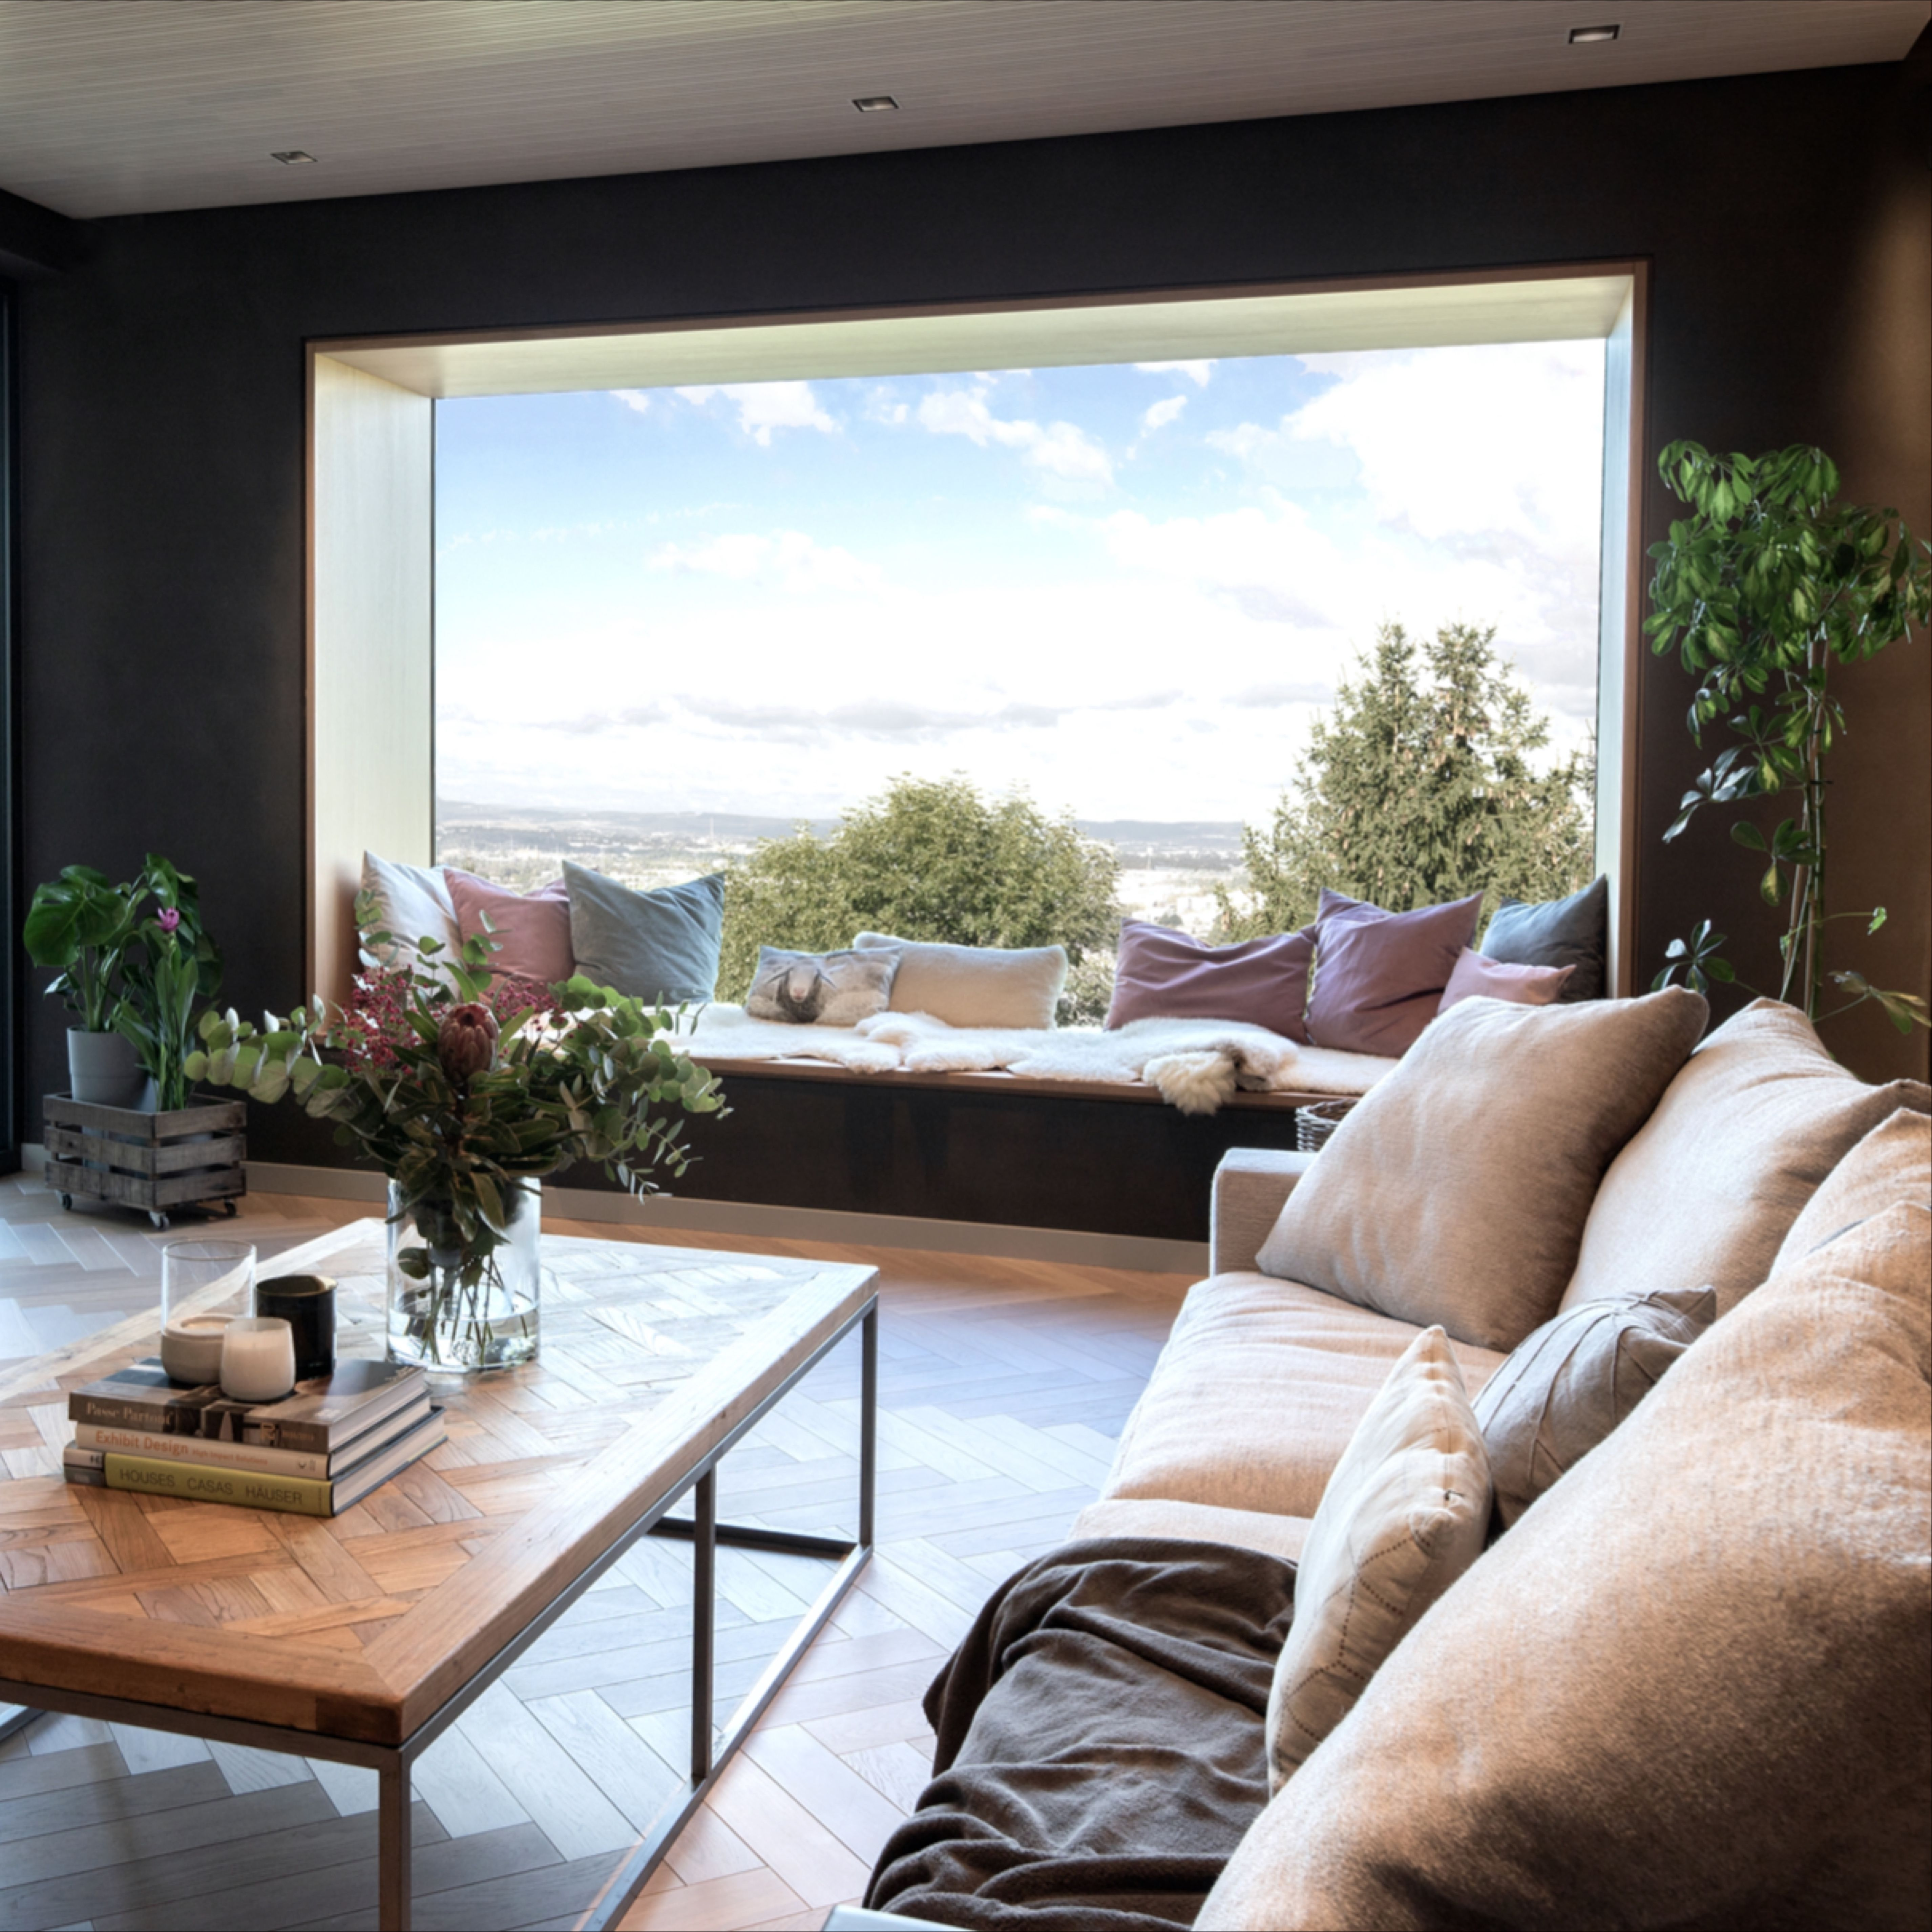 Panoramafenster   Panorama fenster, Hausrenovierung, Innenarchitektur